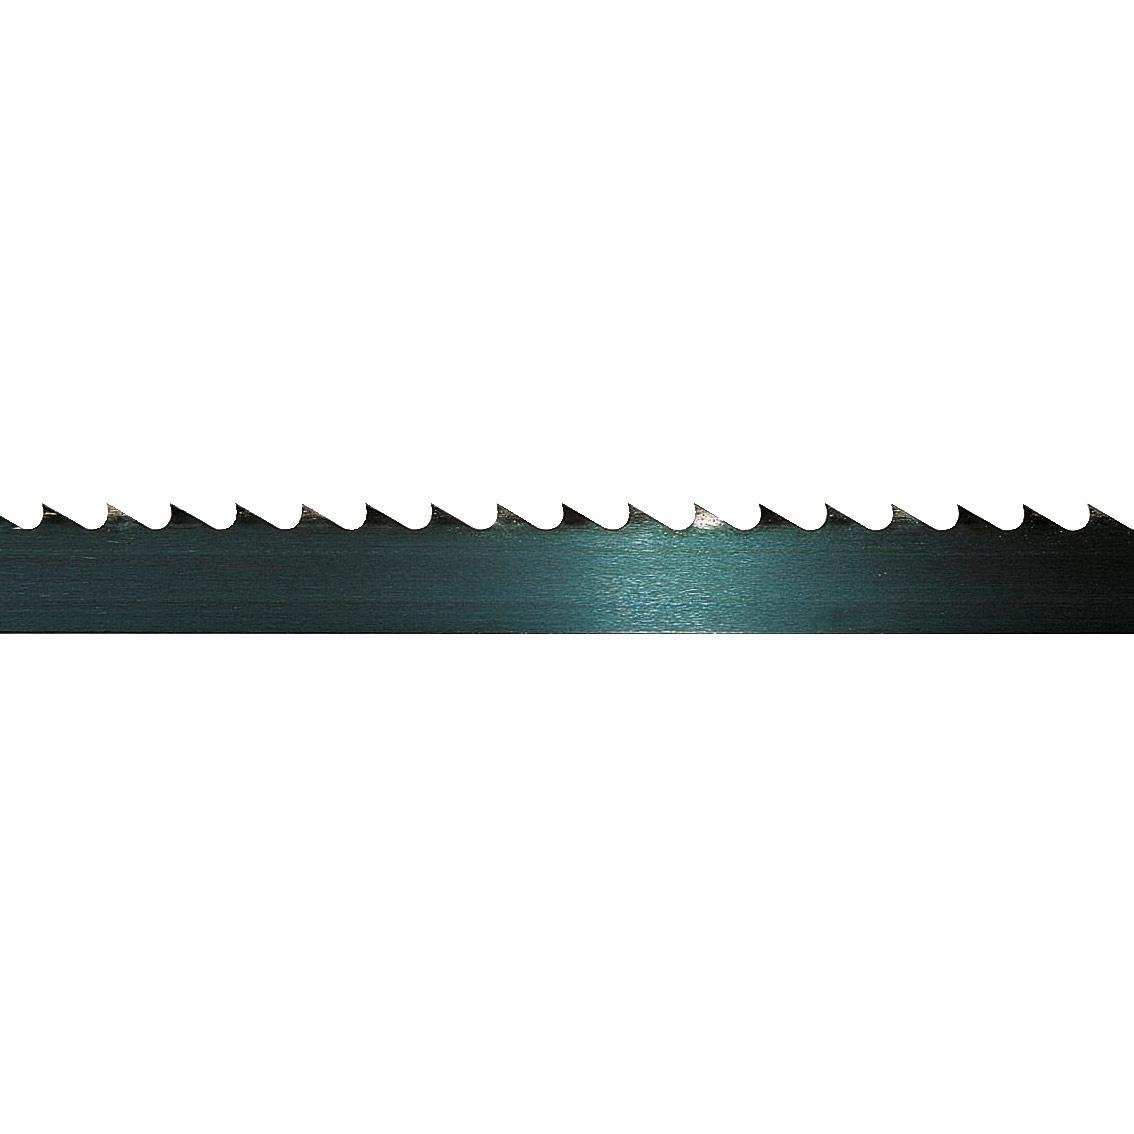 Scheppach Lintzaagblad 12x0,5x2360mm BASA3 -  4TPI   Geschikt voor RVS